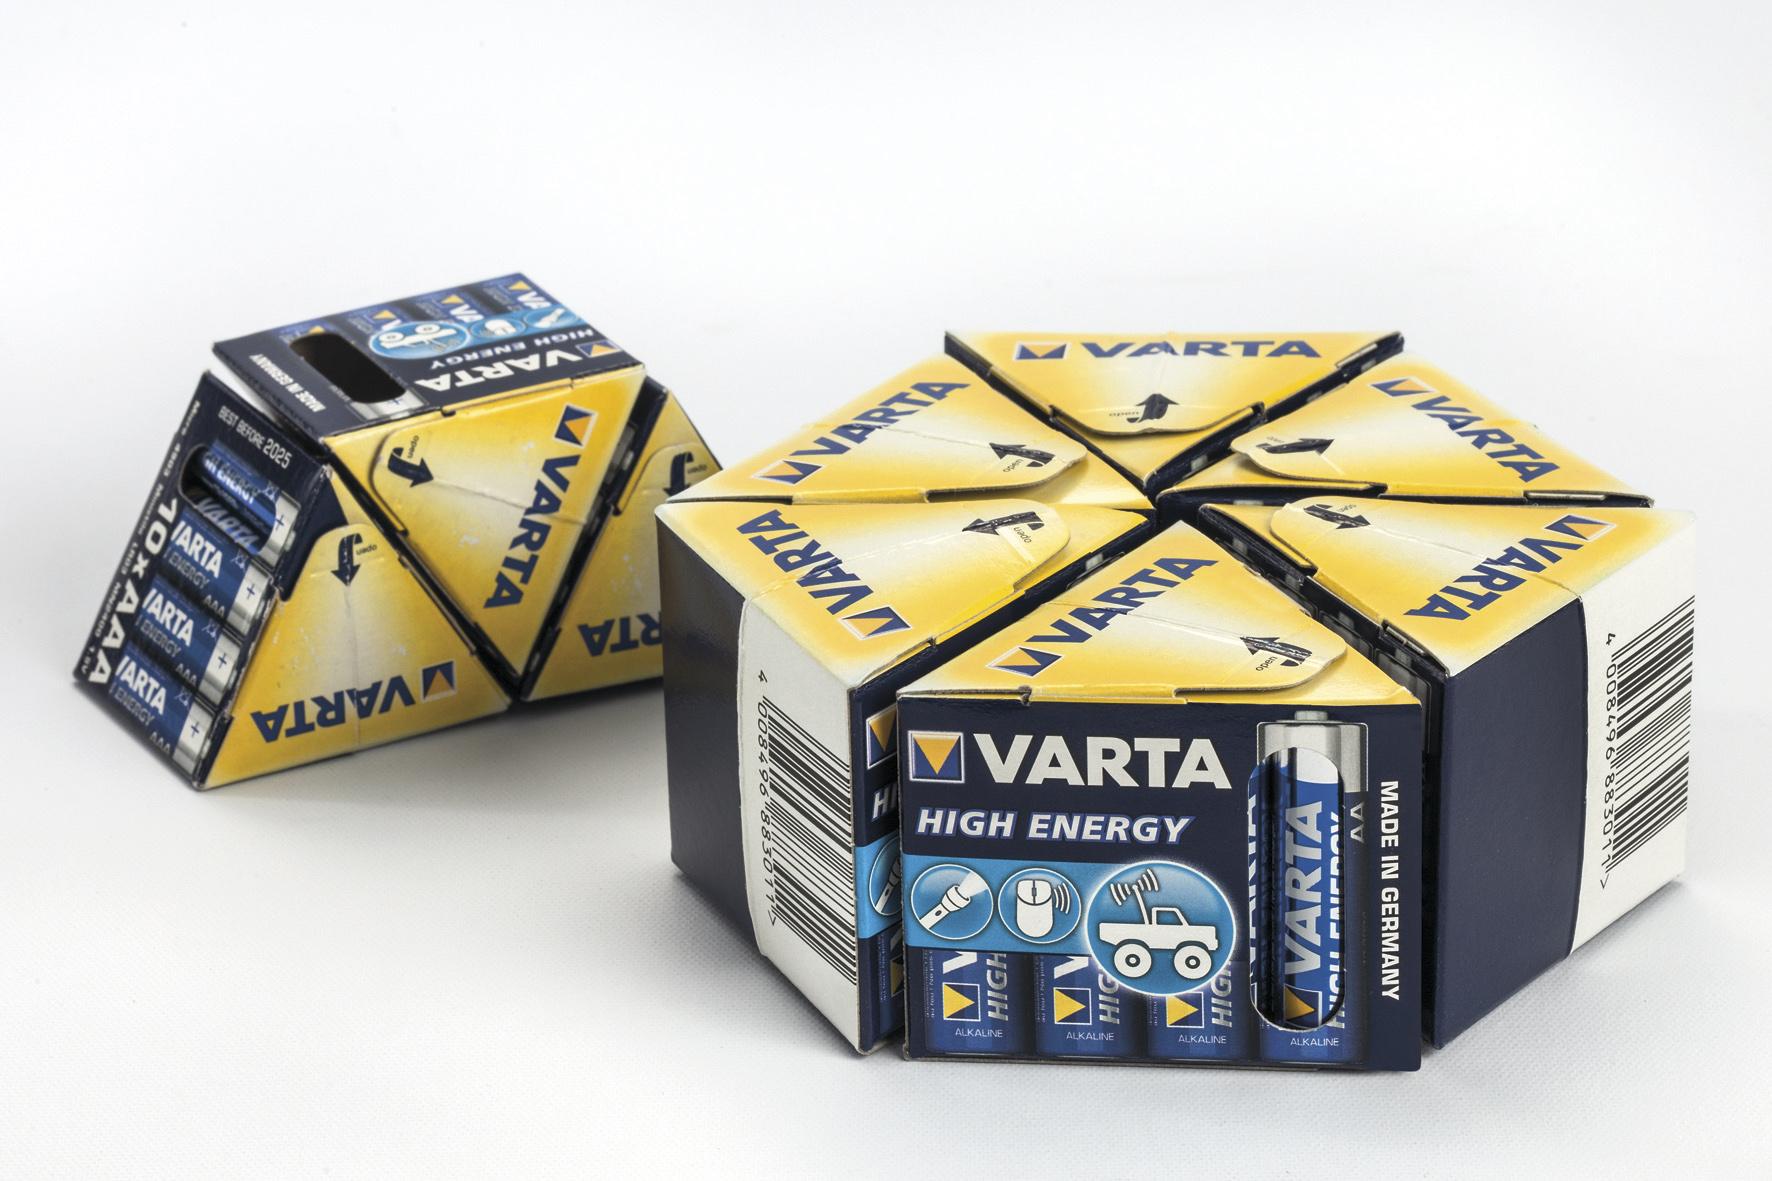 carton-award-image 129440